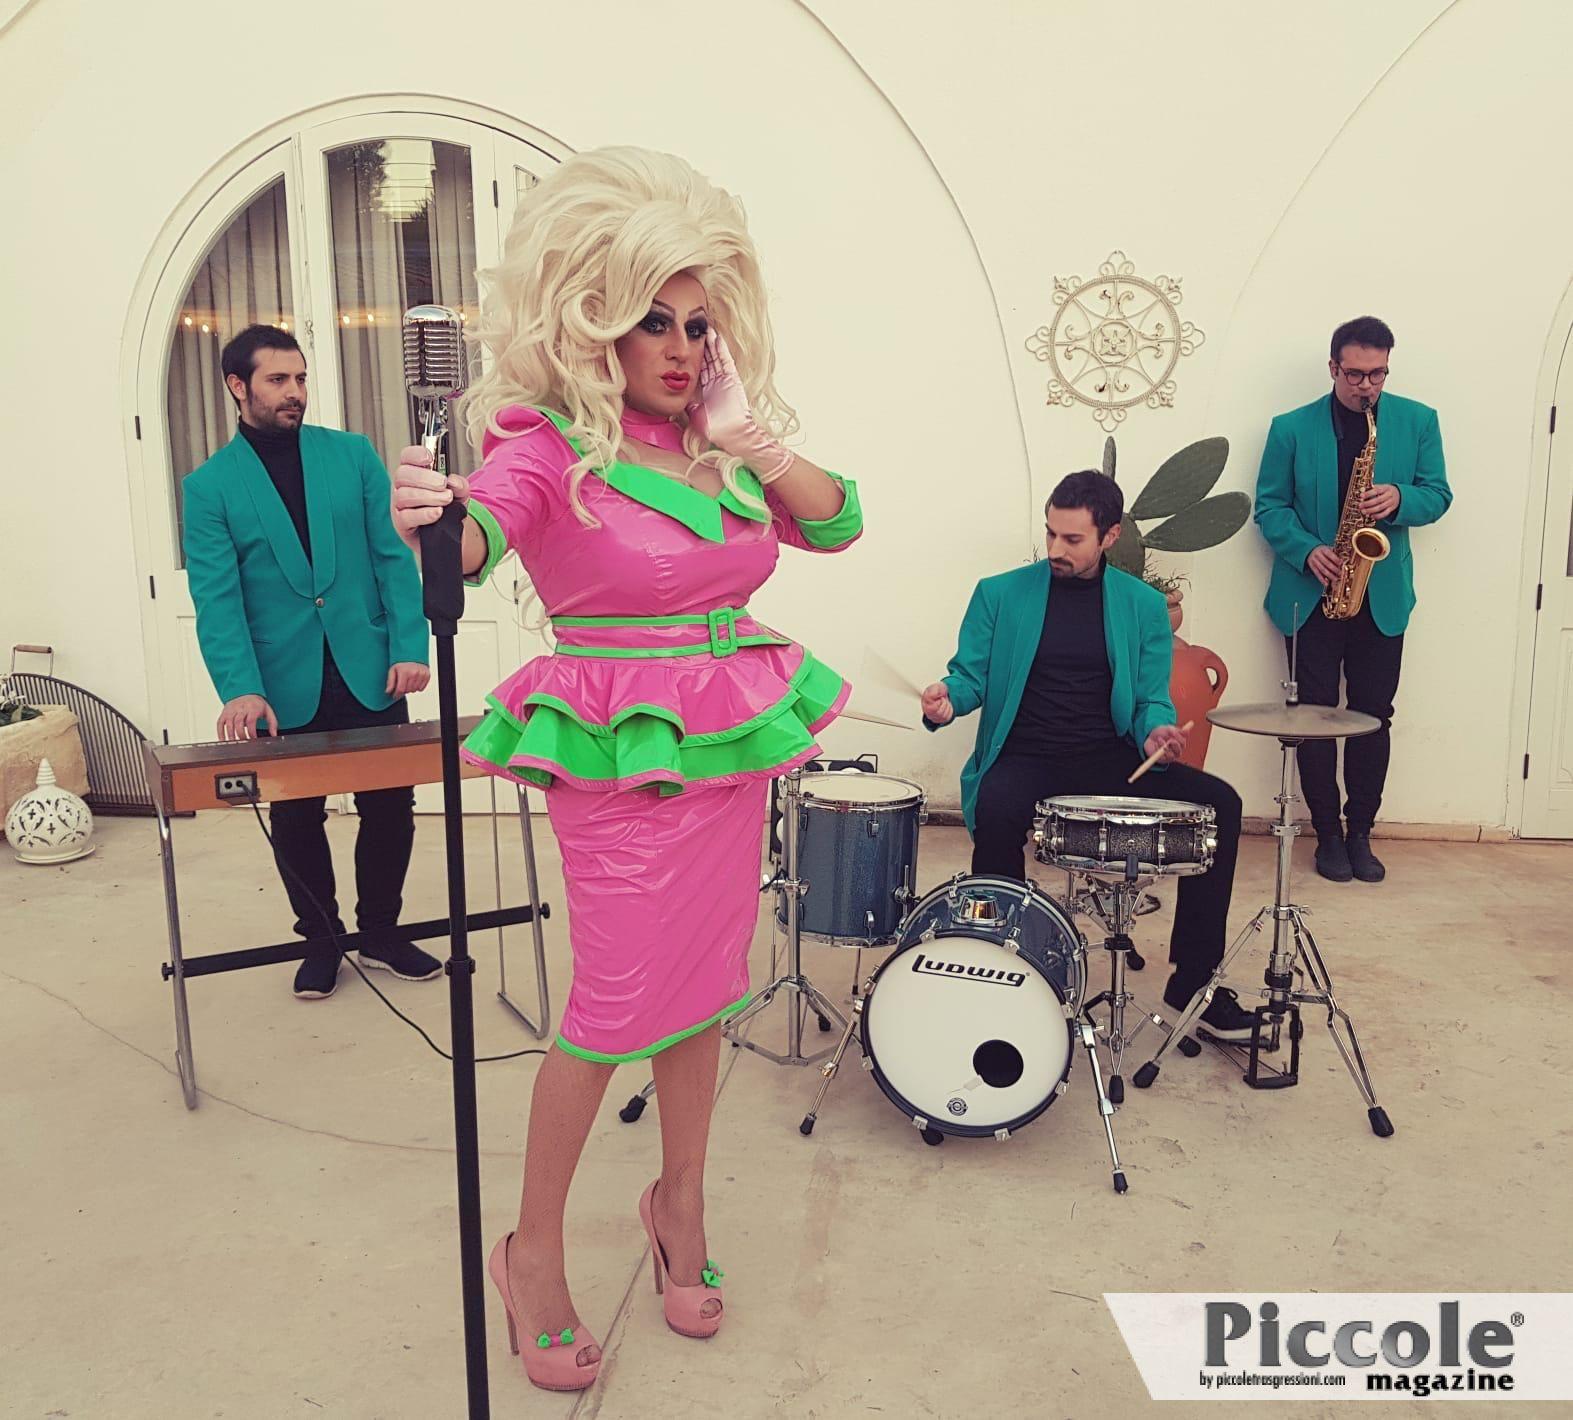 Intervista a Tekemaya, drag queen singer di The Voice of Italy 2018